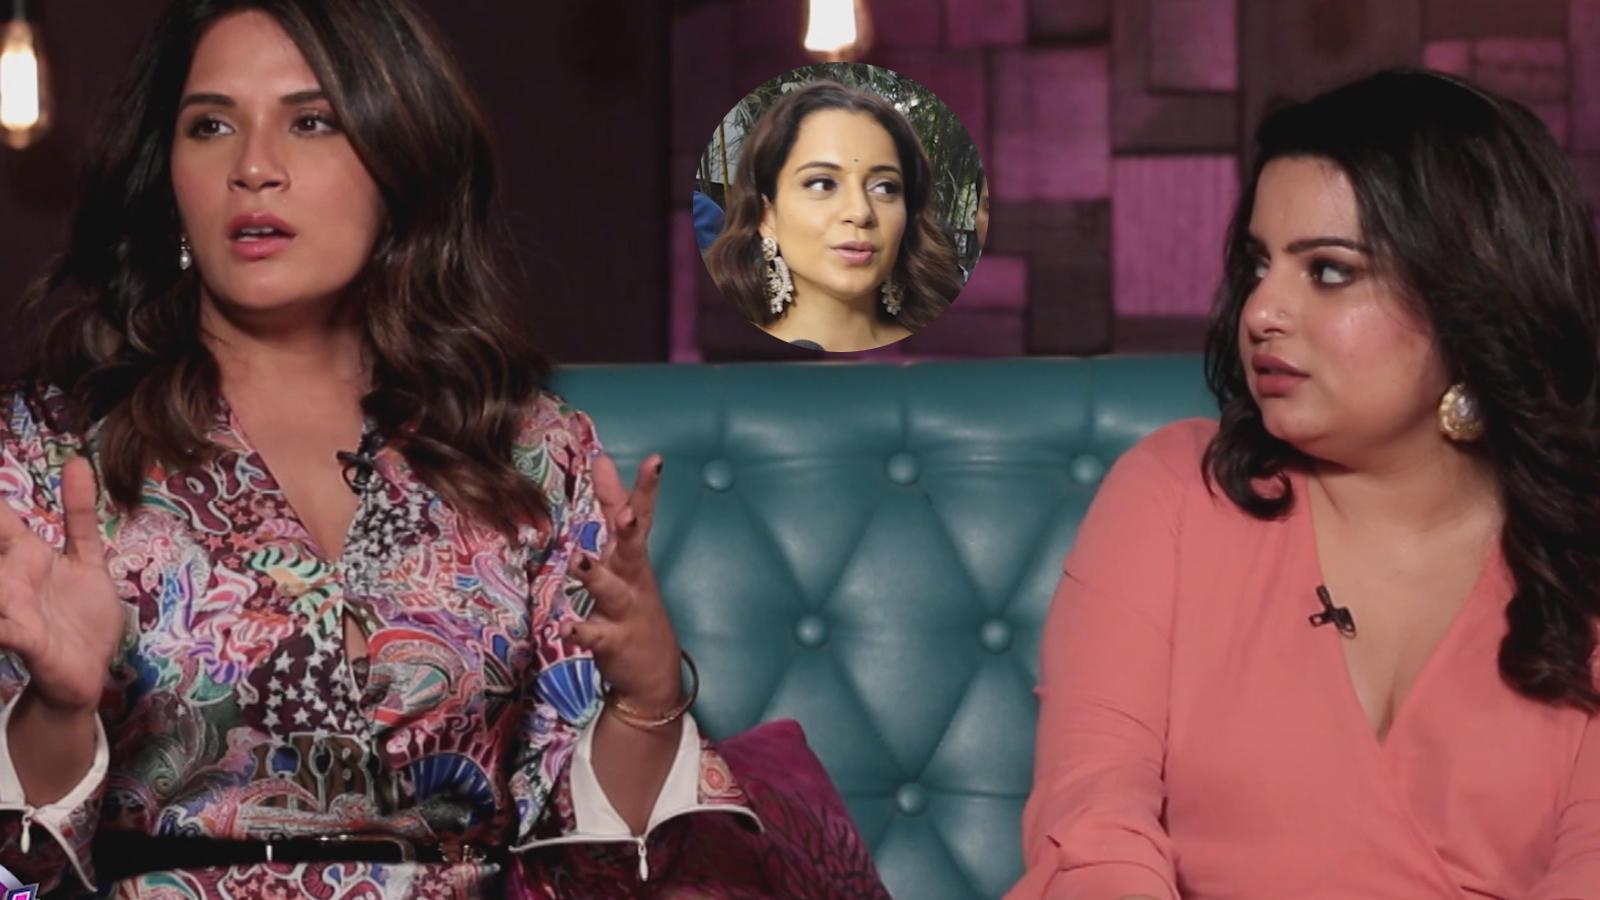 Richa Chadha and Mallika Dua share their opinion on Kangana Ranaut's outspoken nature